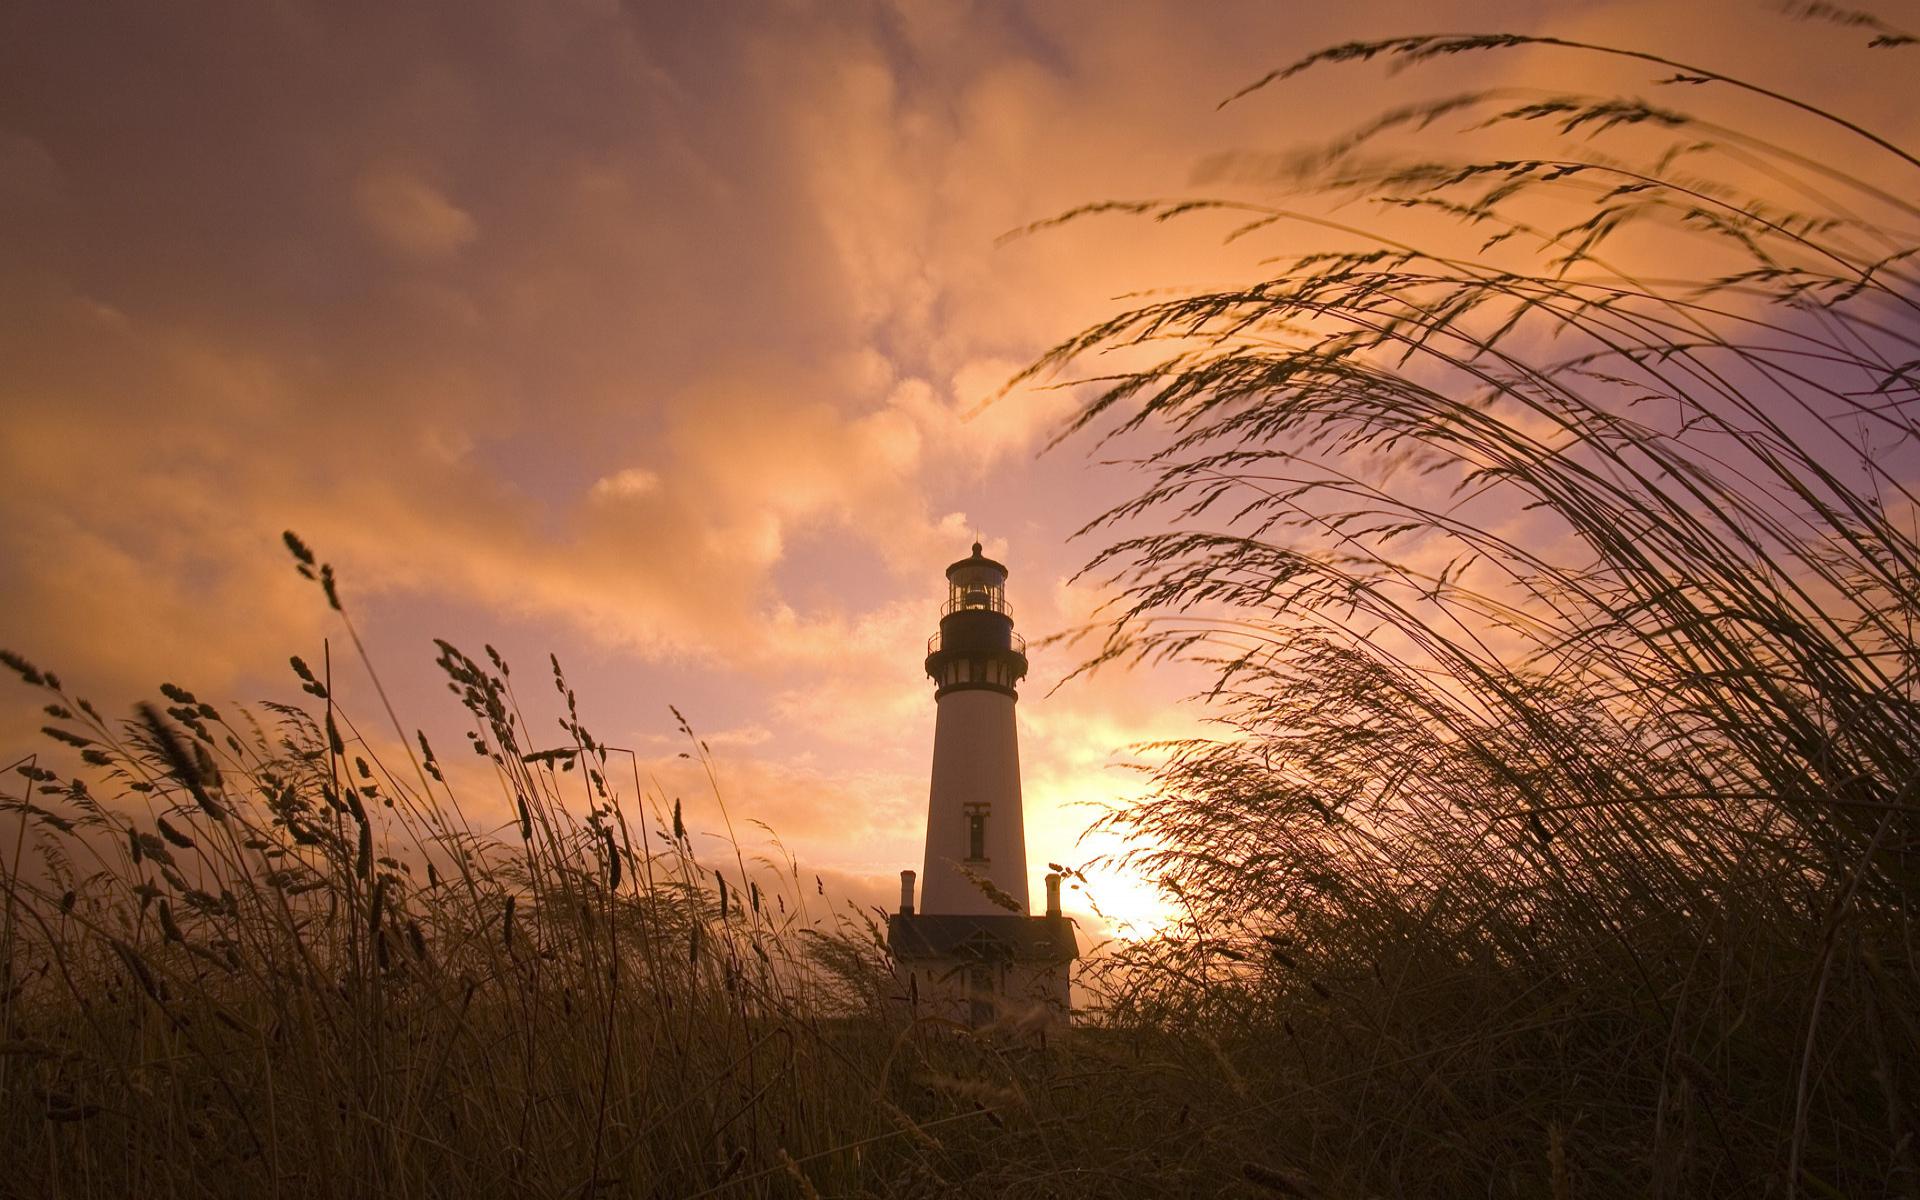 Man Made - Lighthouse  Sunrise Sunset Wallpaper